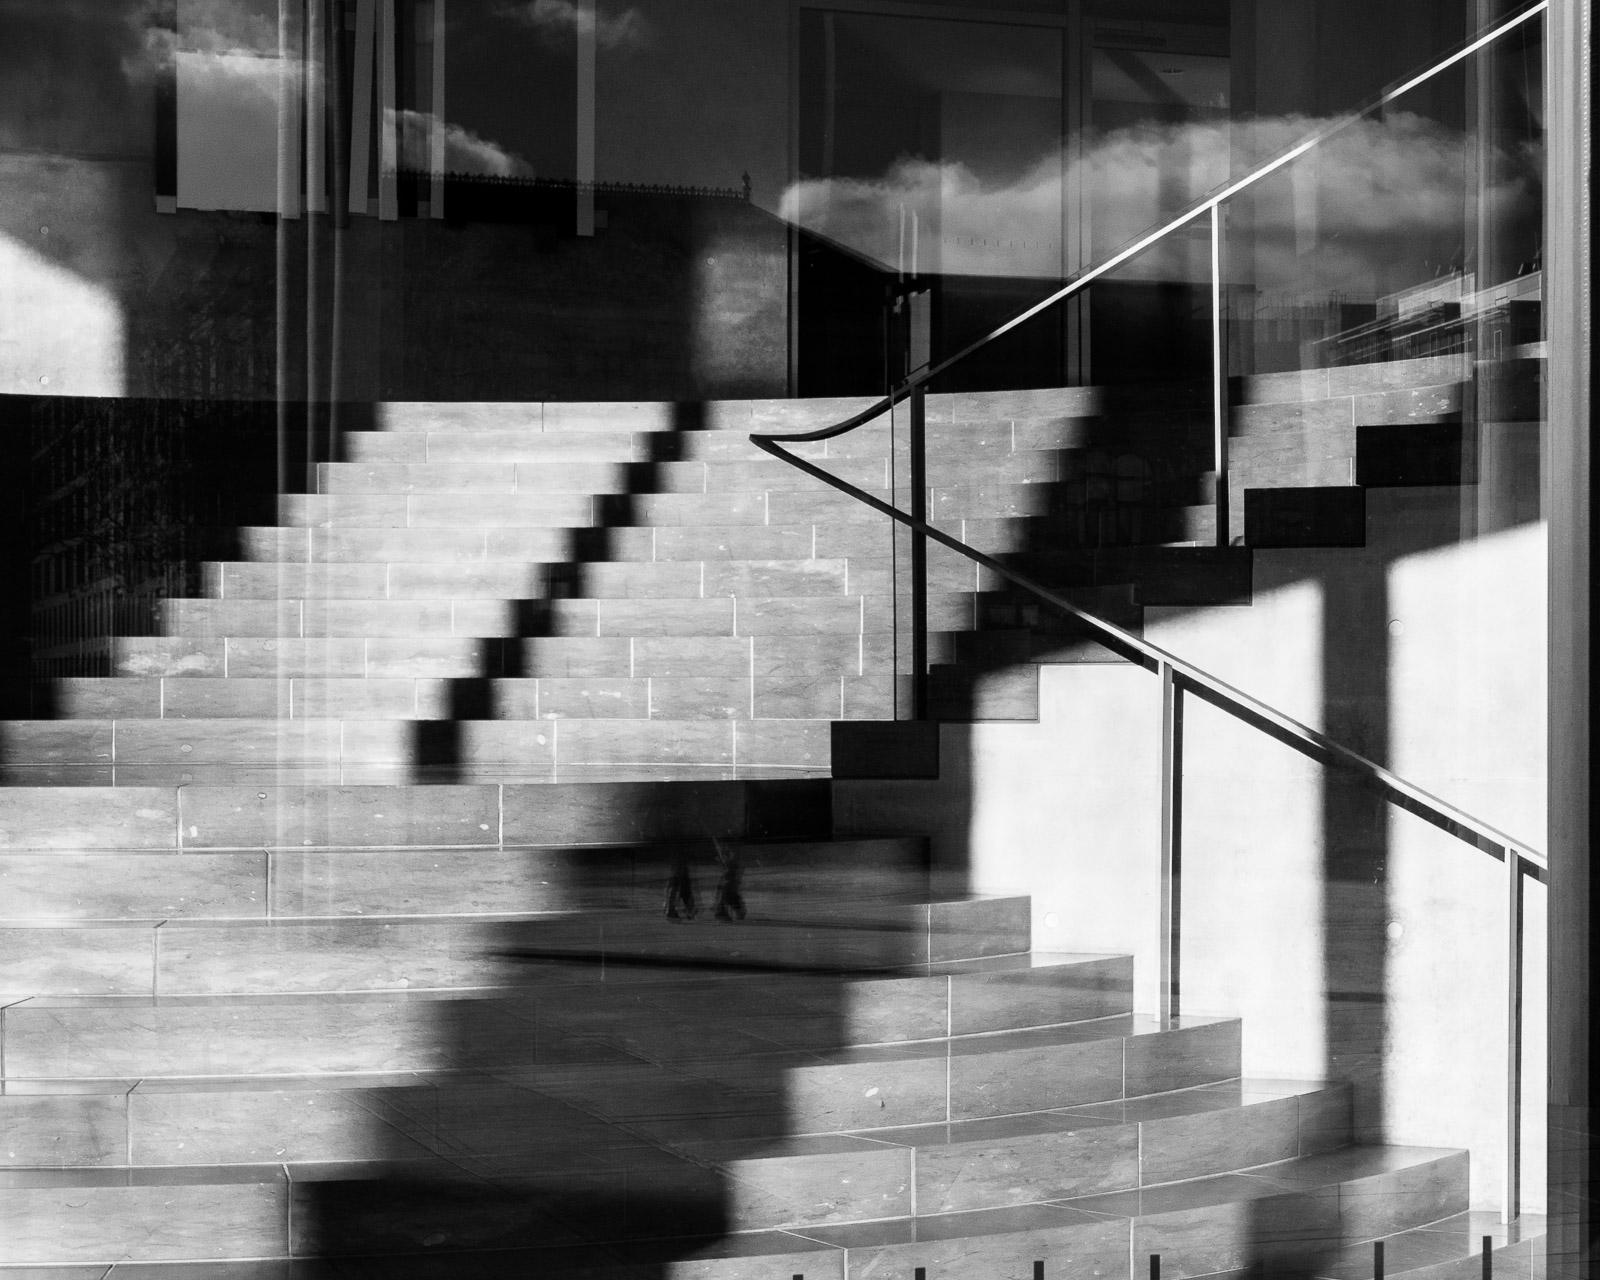 Steps, Berlin